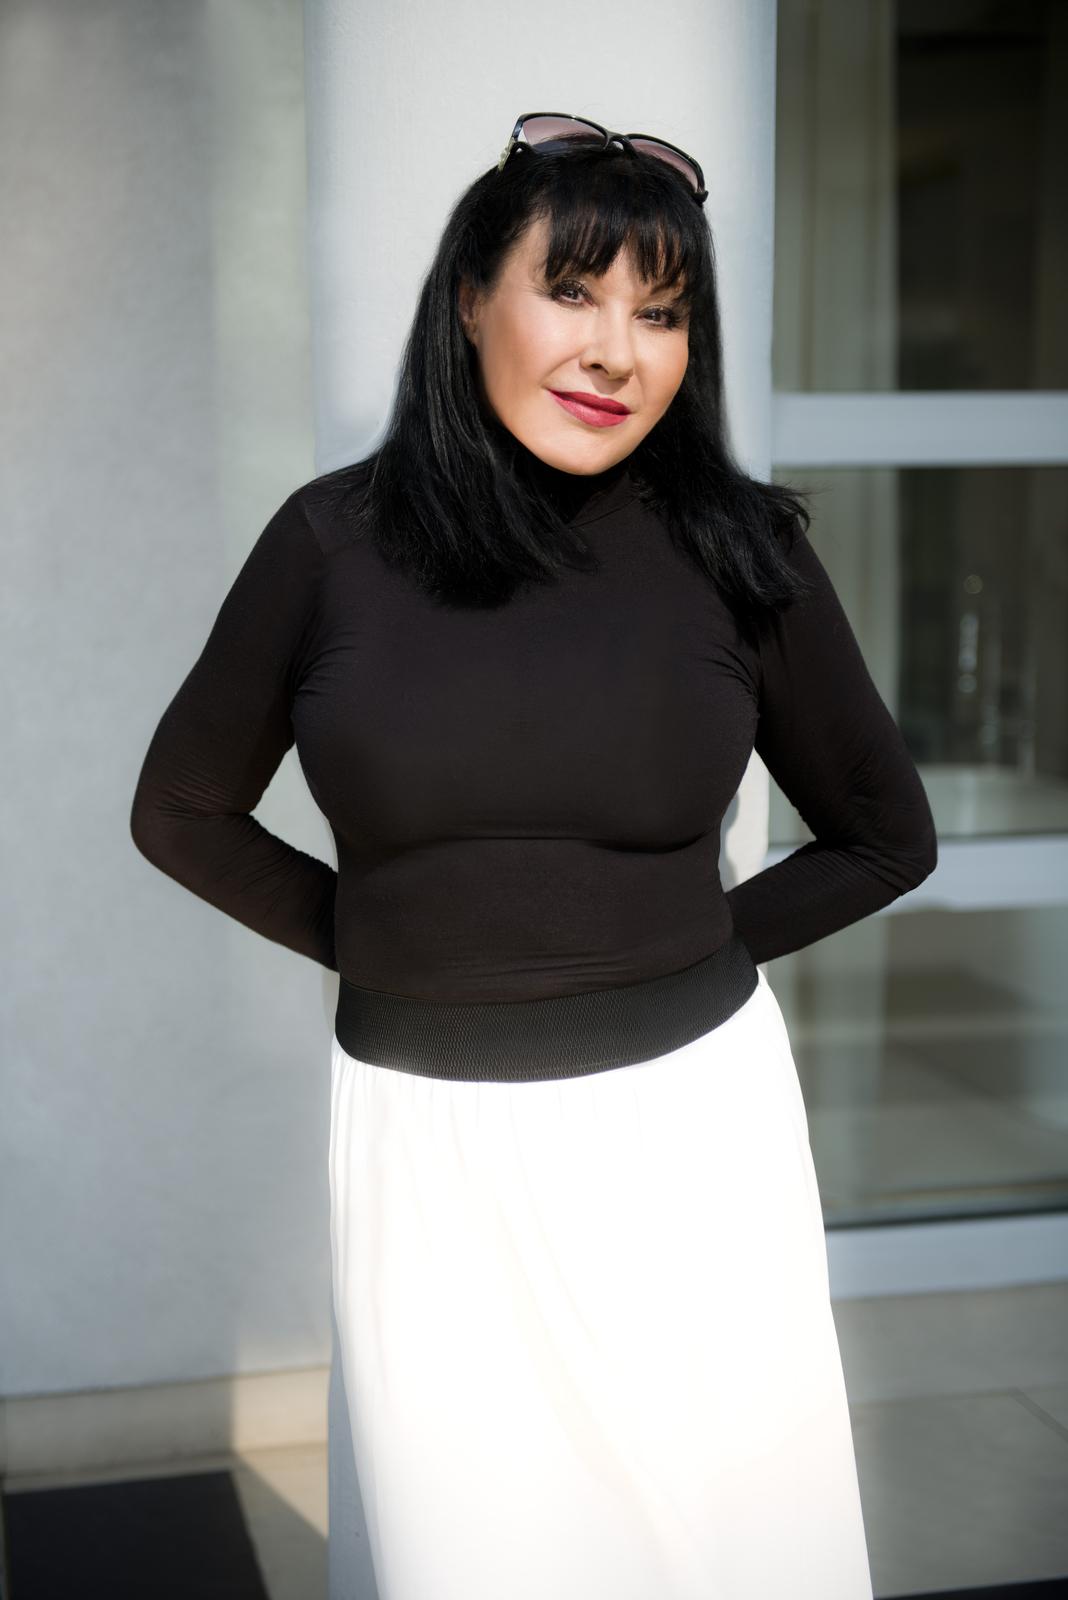 Dagmar Patrasová zhubla osm kilo